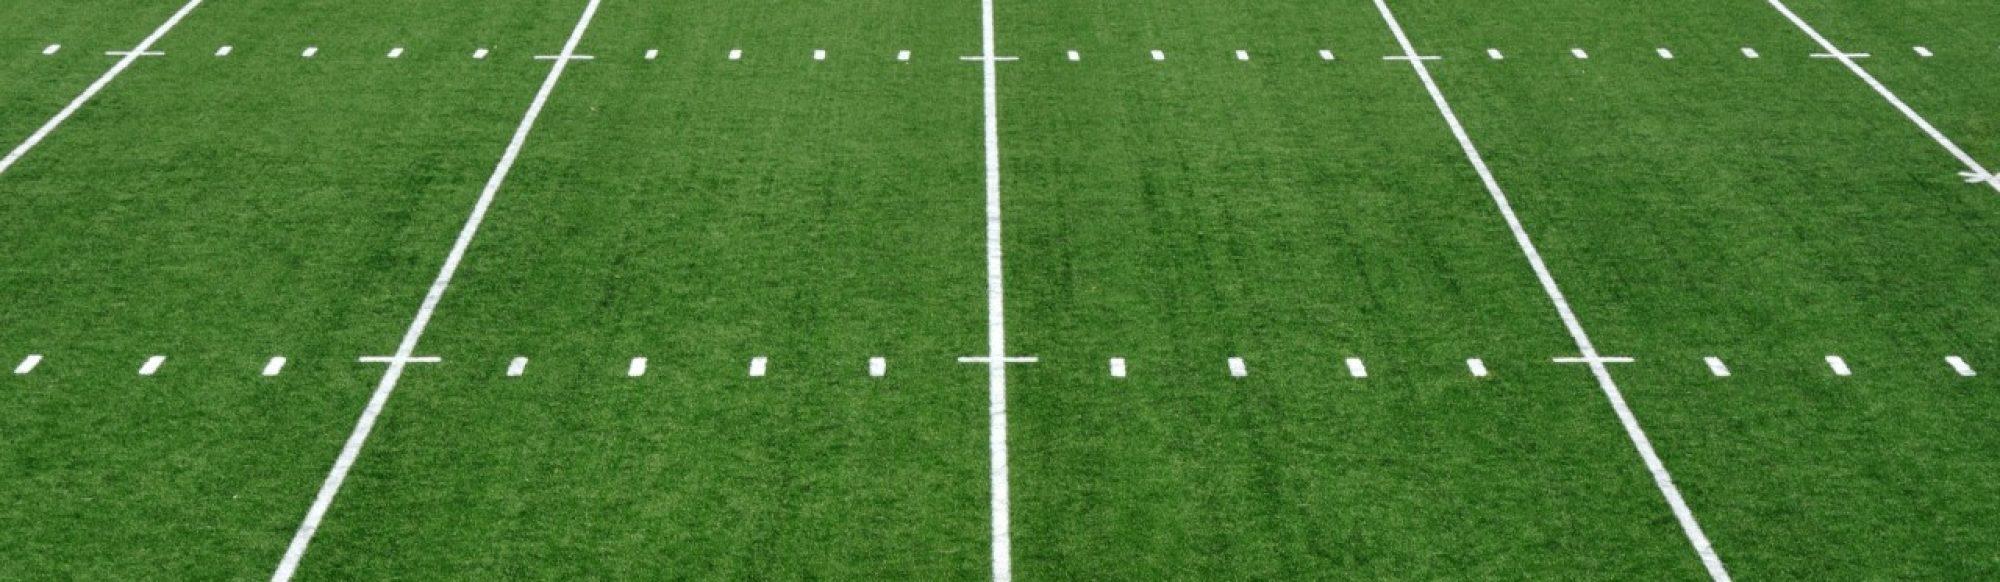 Football Field Clipart.